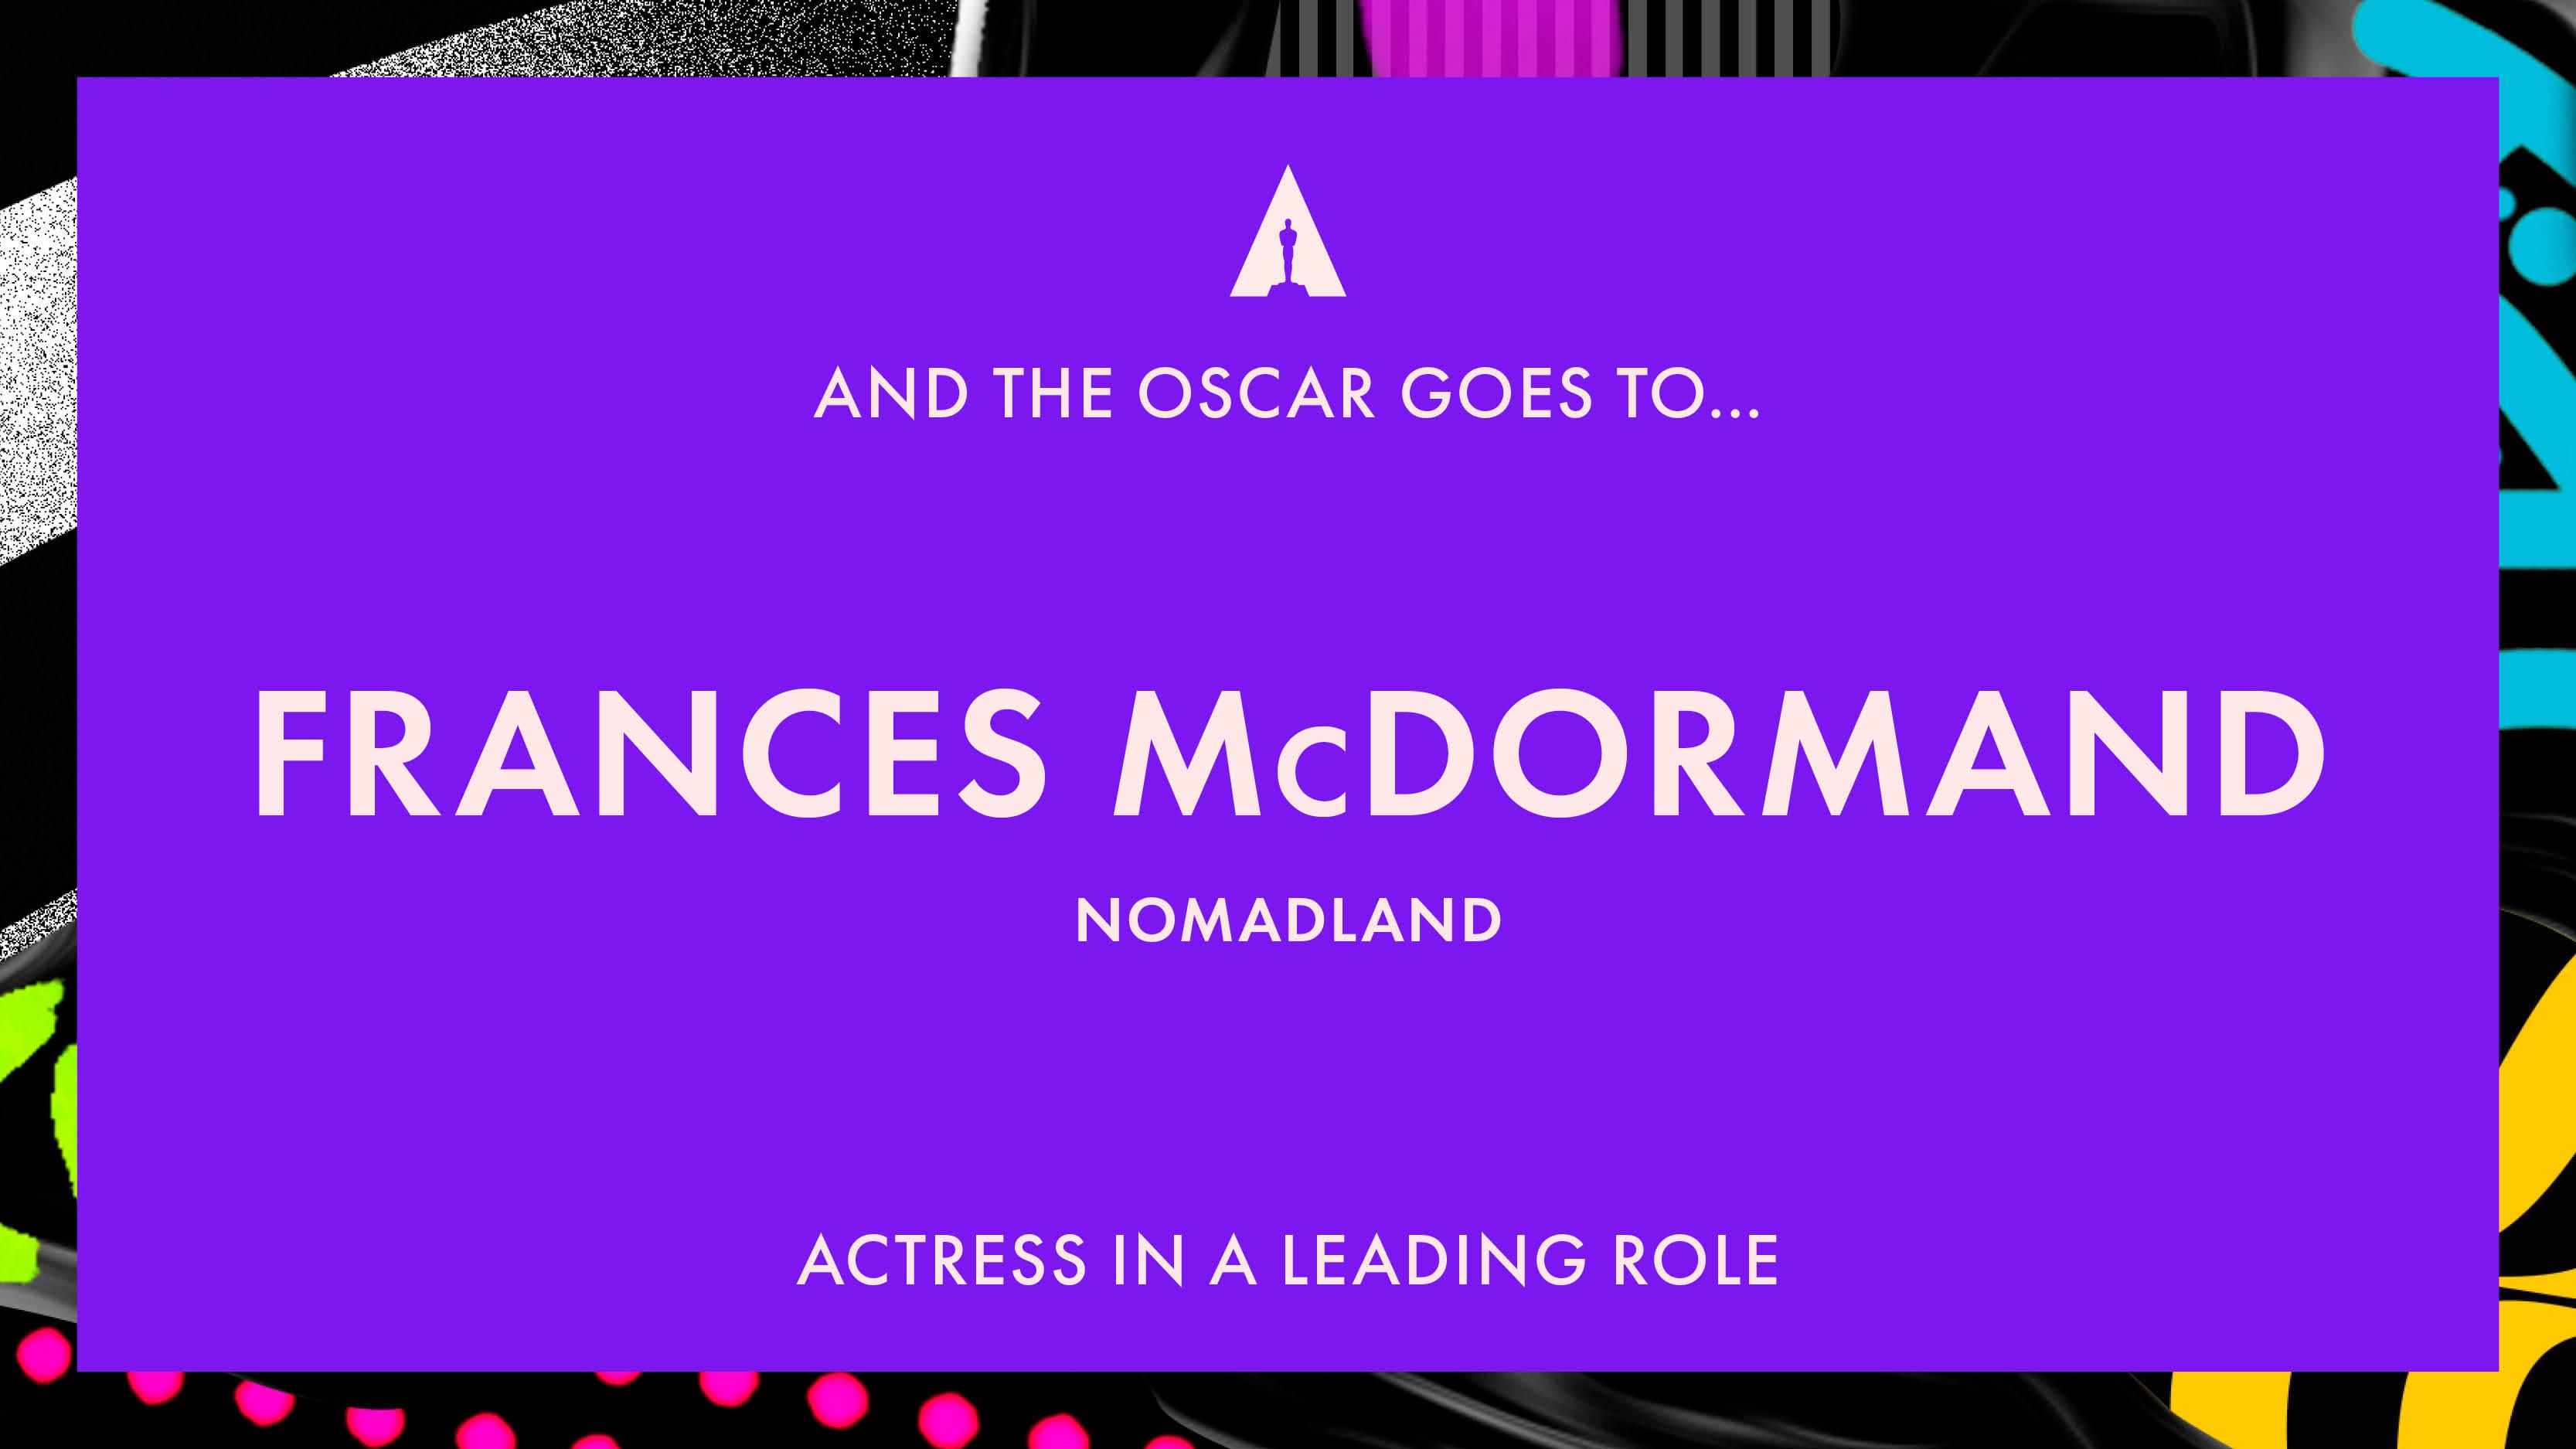 Oscar 2021: Frances McDormand migliore attrice protagonista